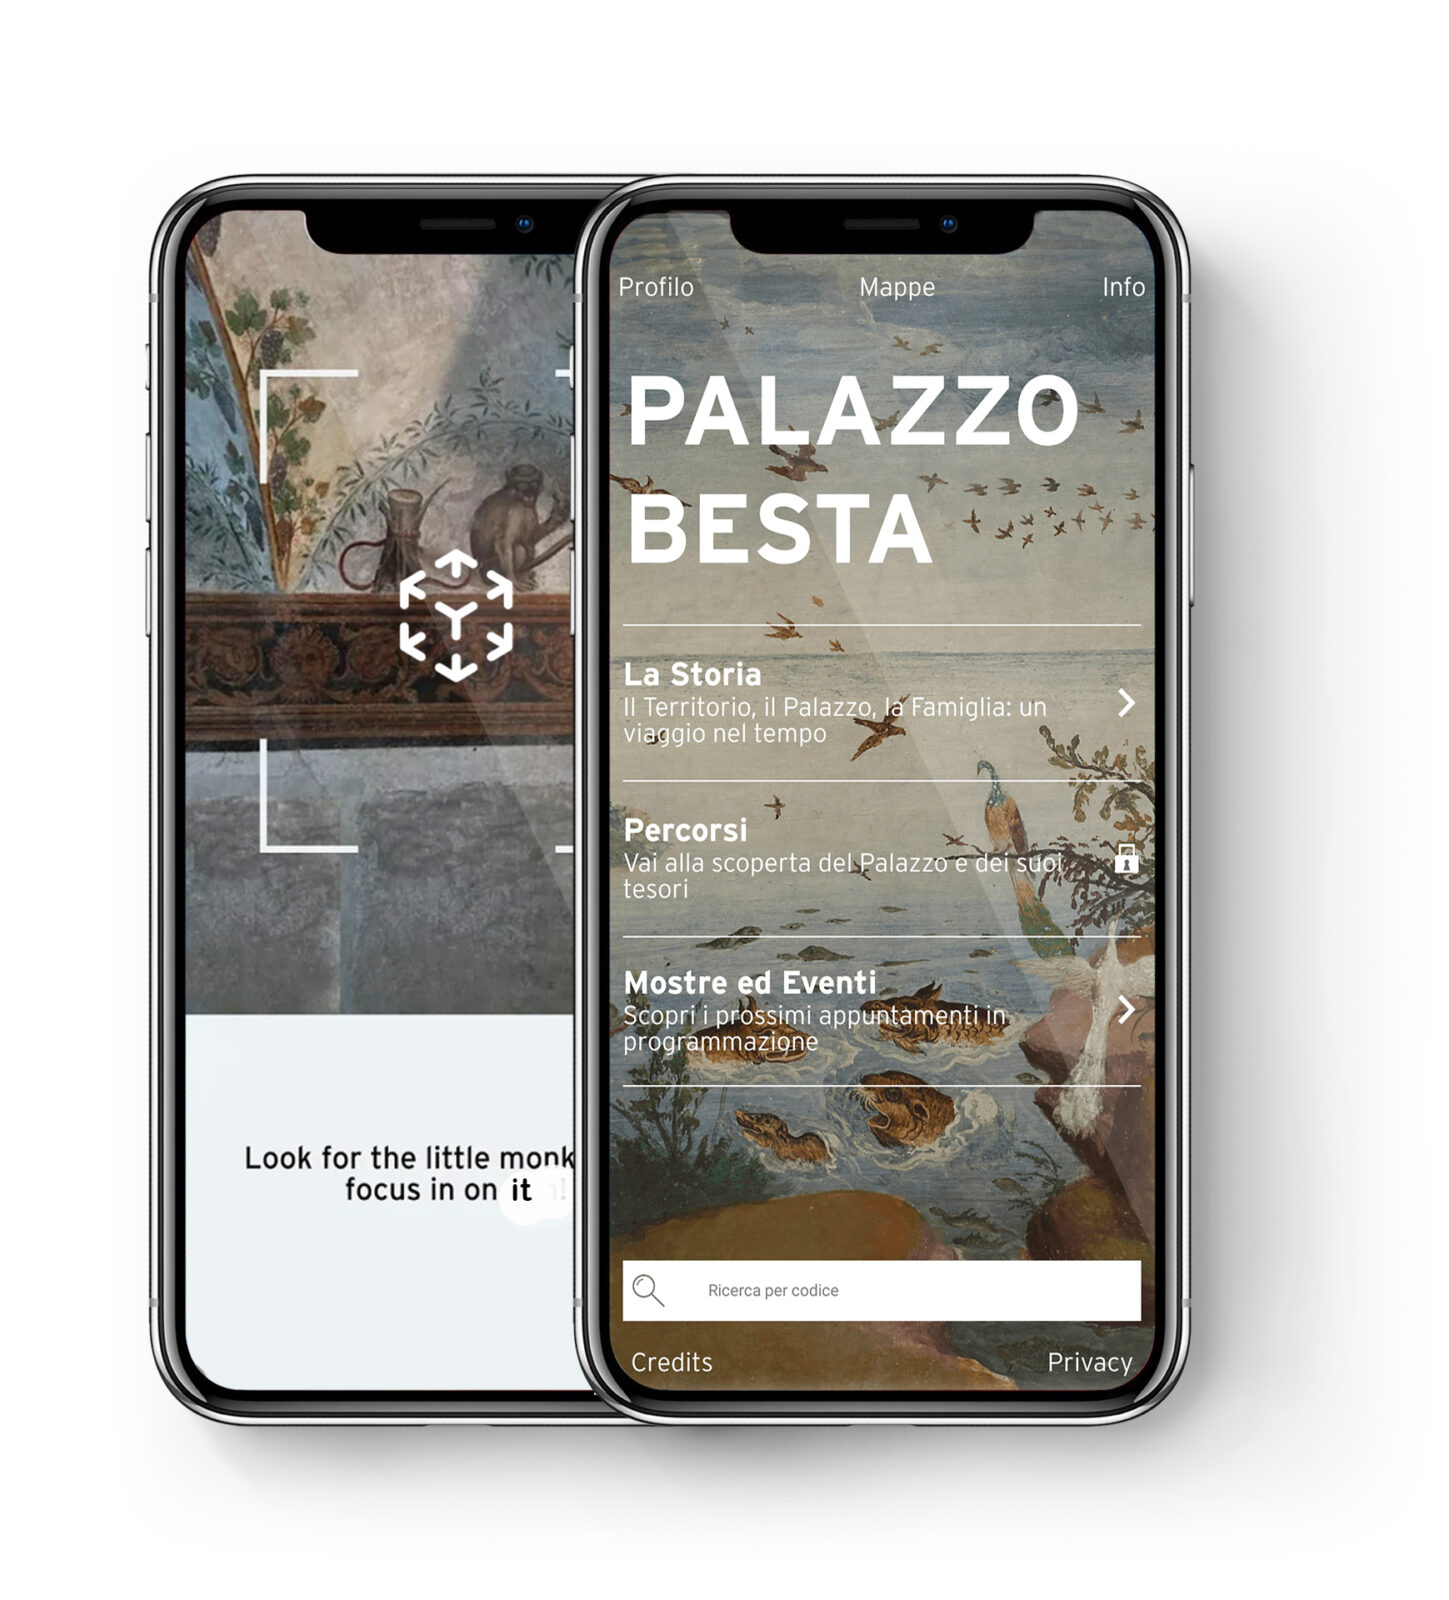 Palazzo Besta App